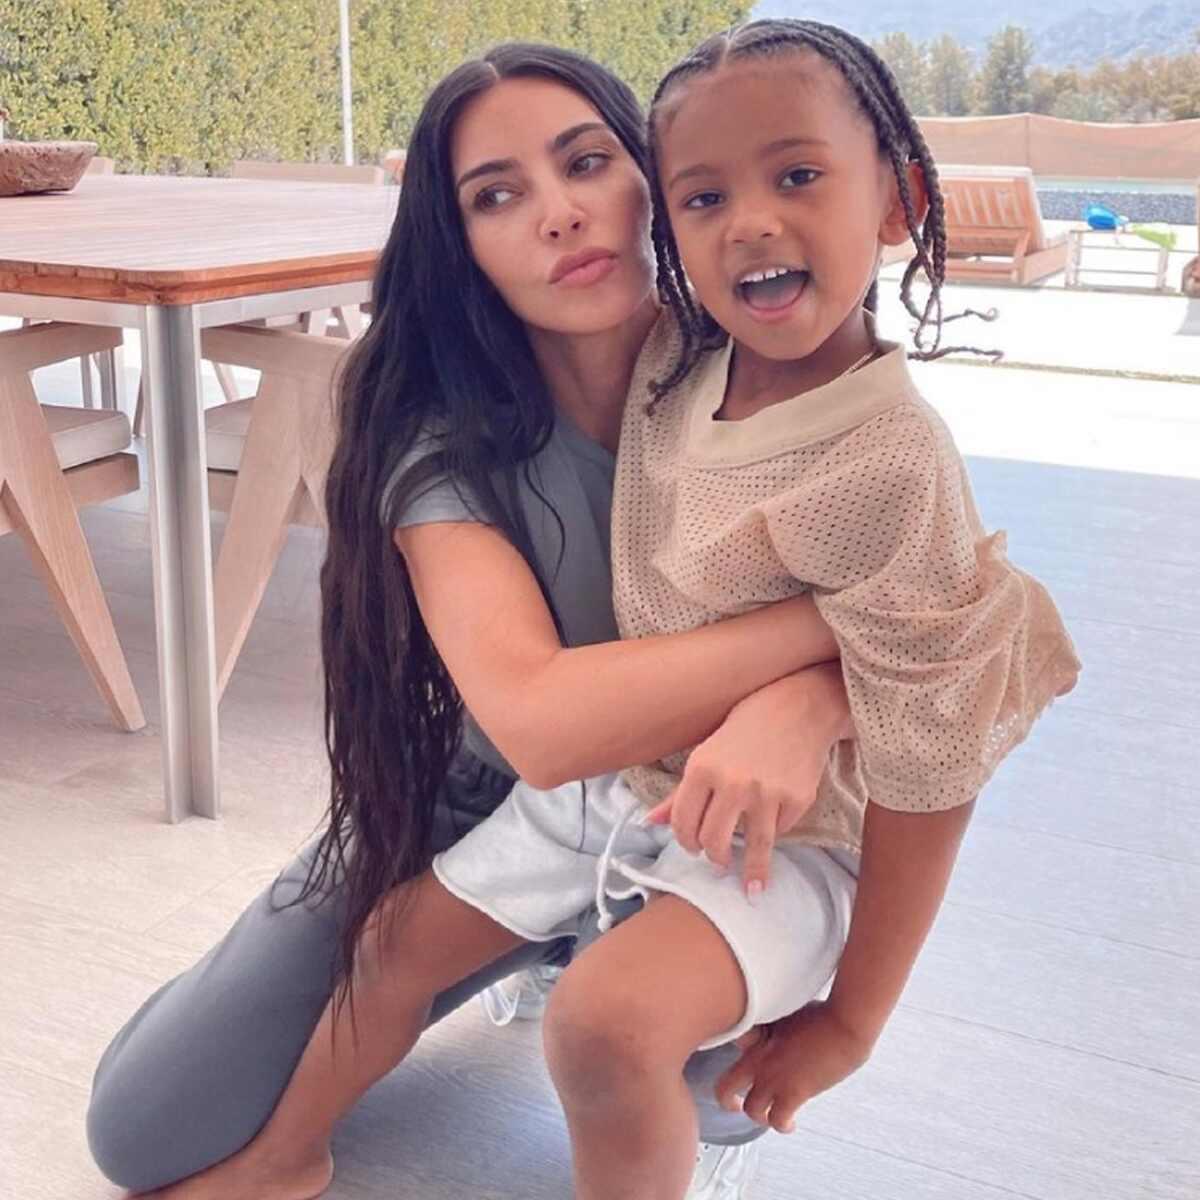 Saint West, Kim Kardashian, KUWTK, Keeping Up With the Kardashians